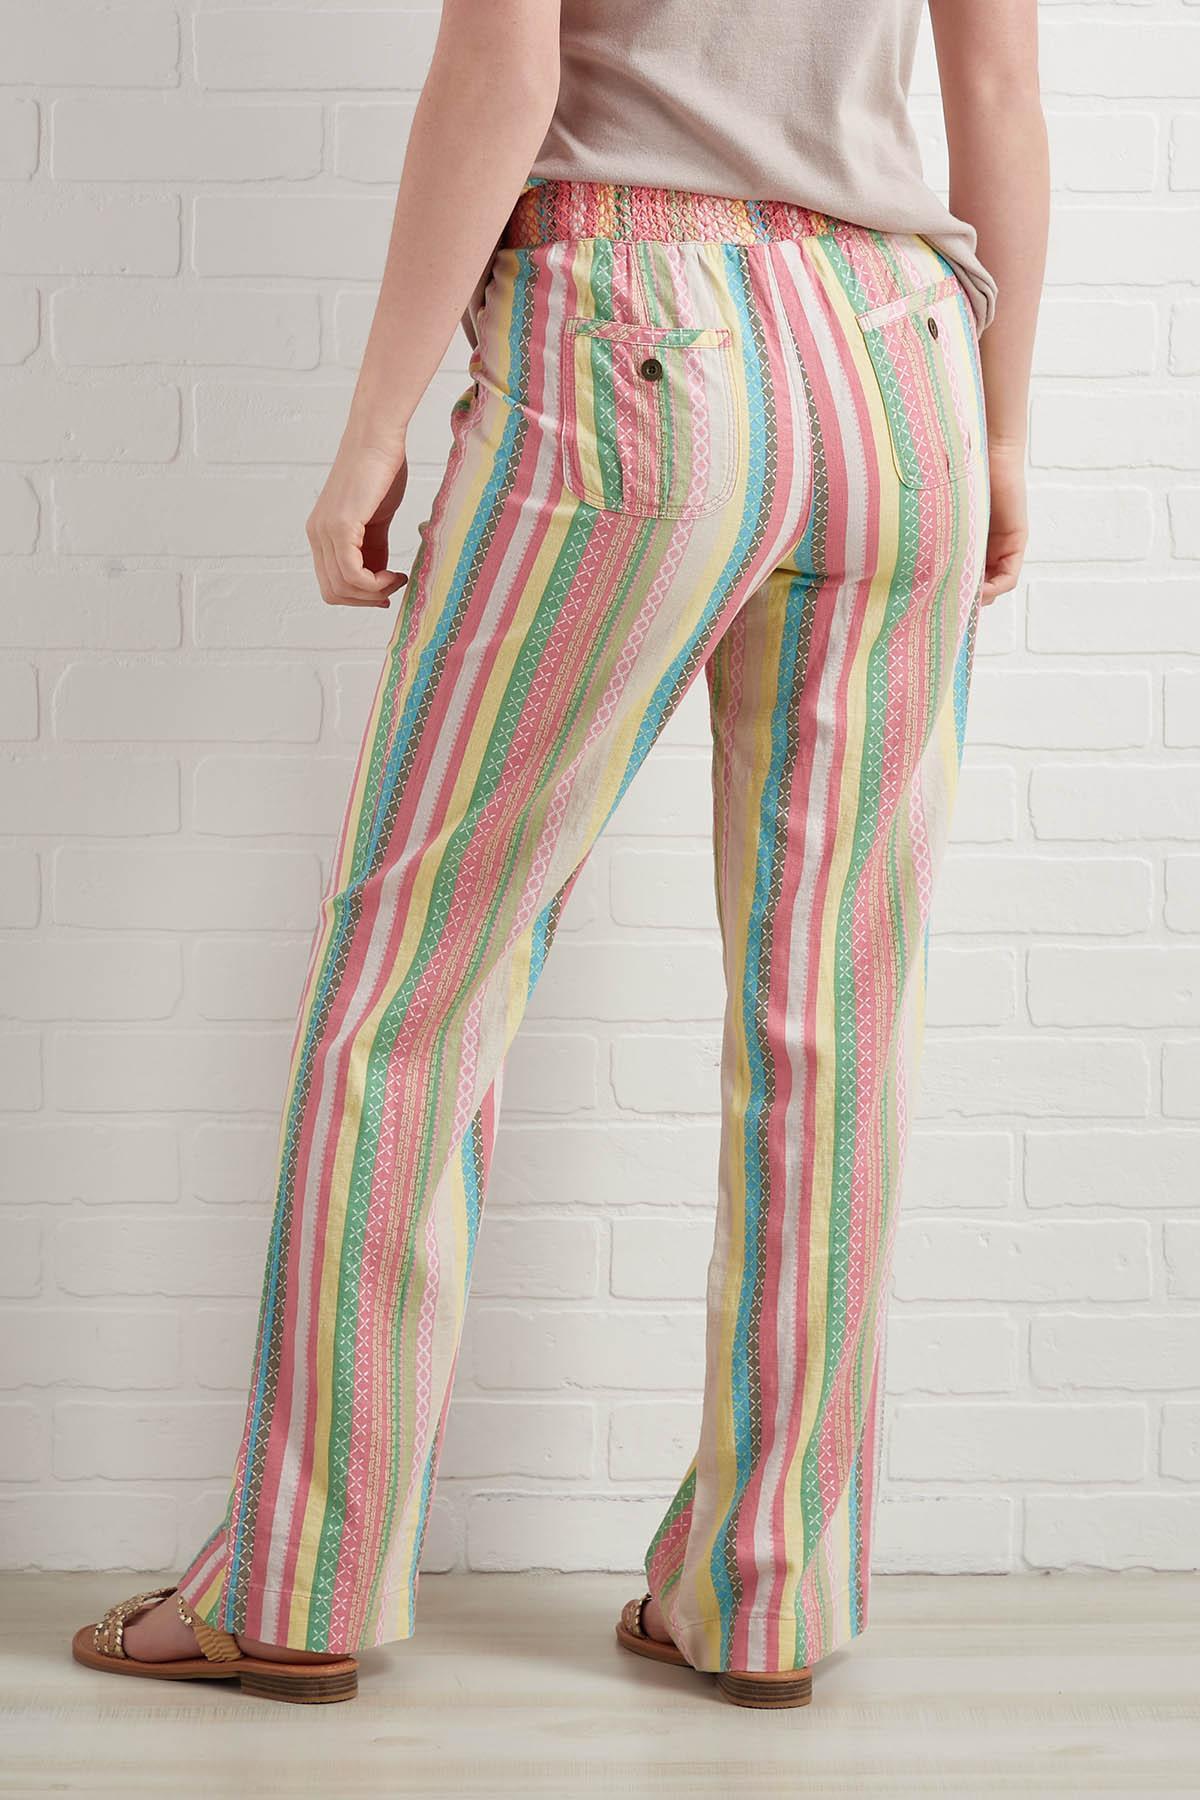 Candy Cutie Pants